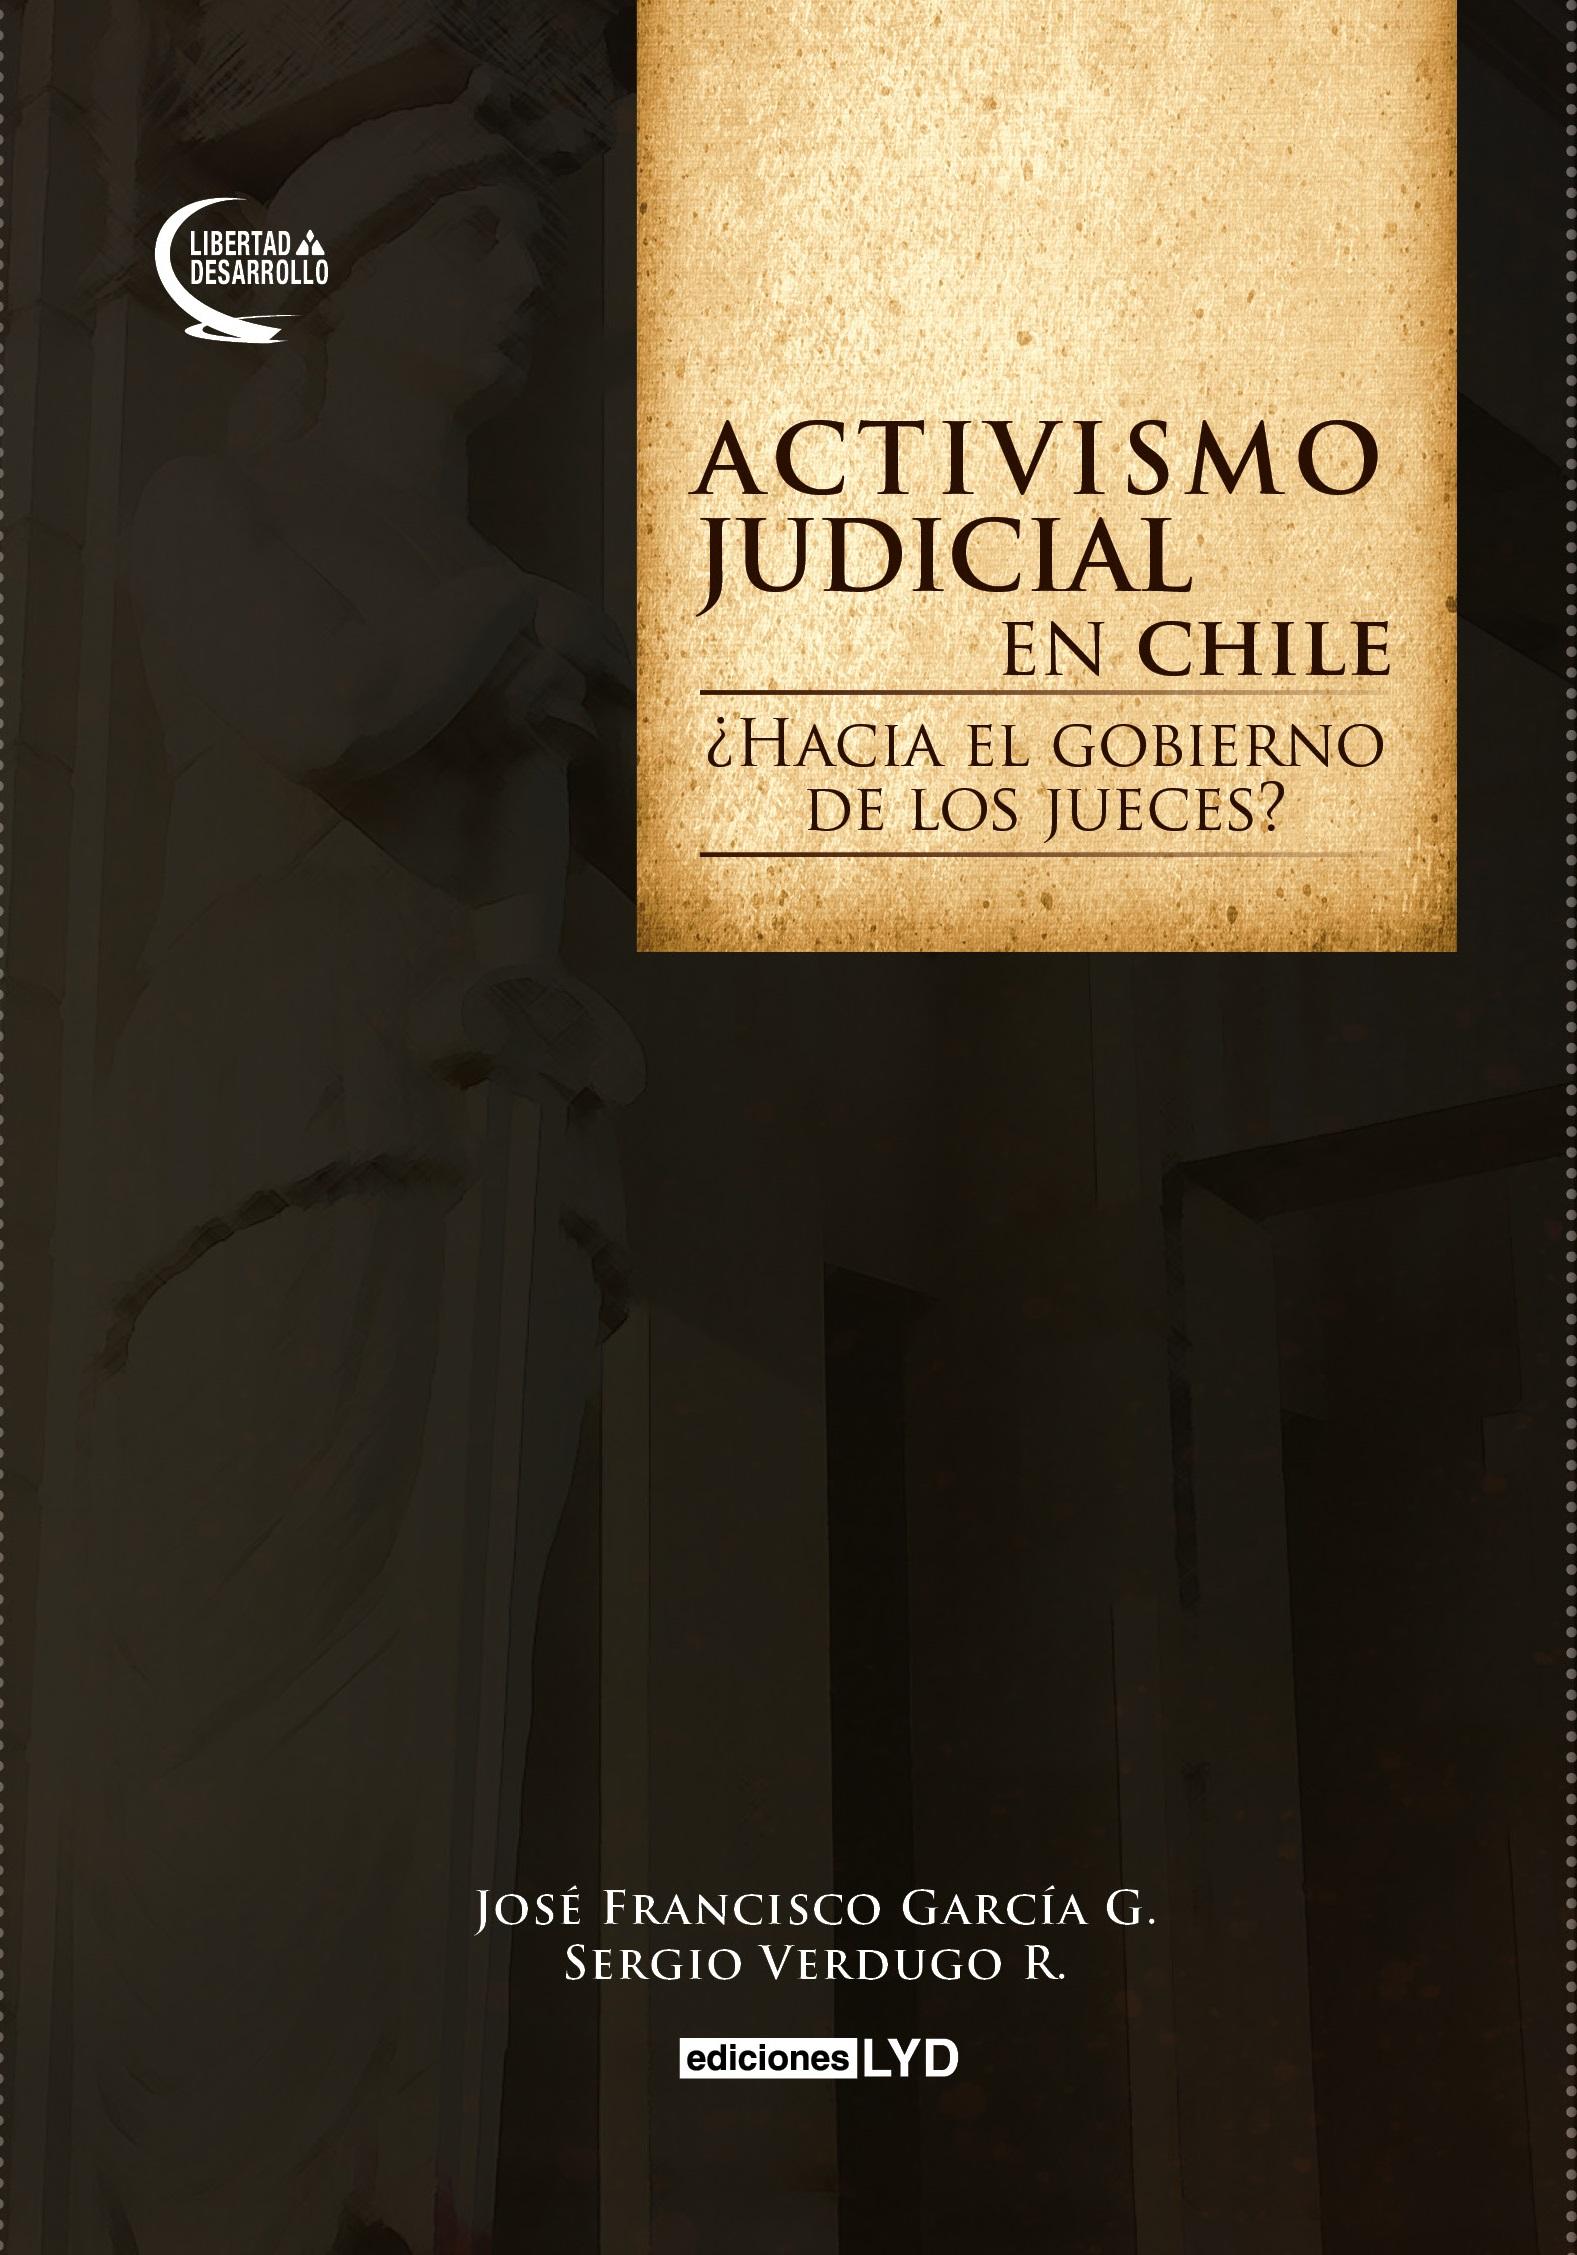 Activismos Judicial